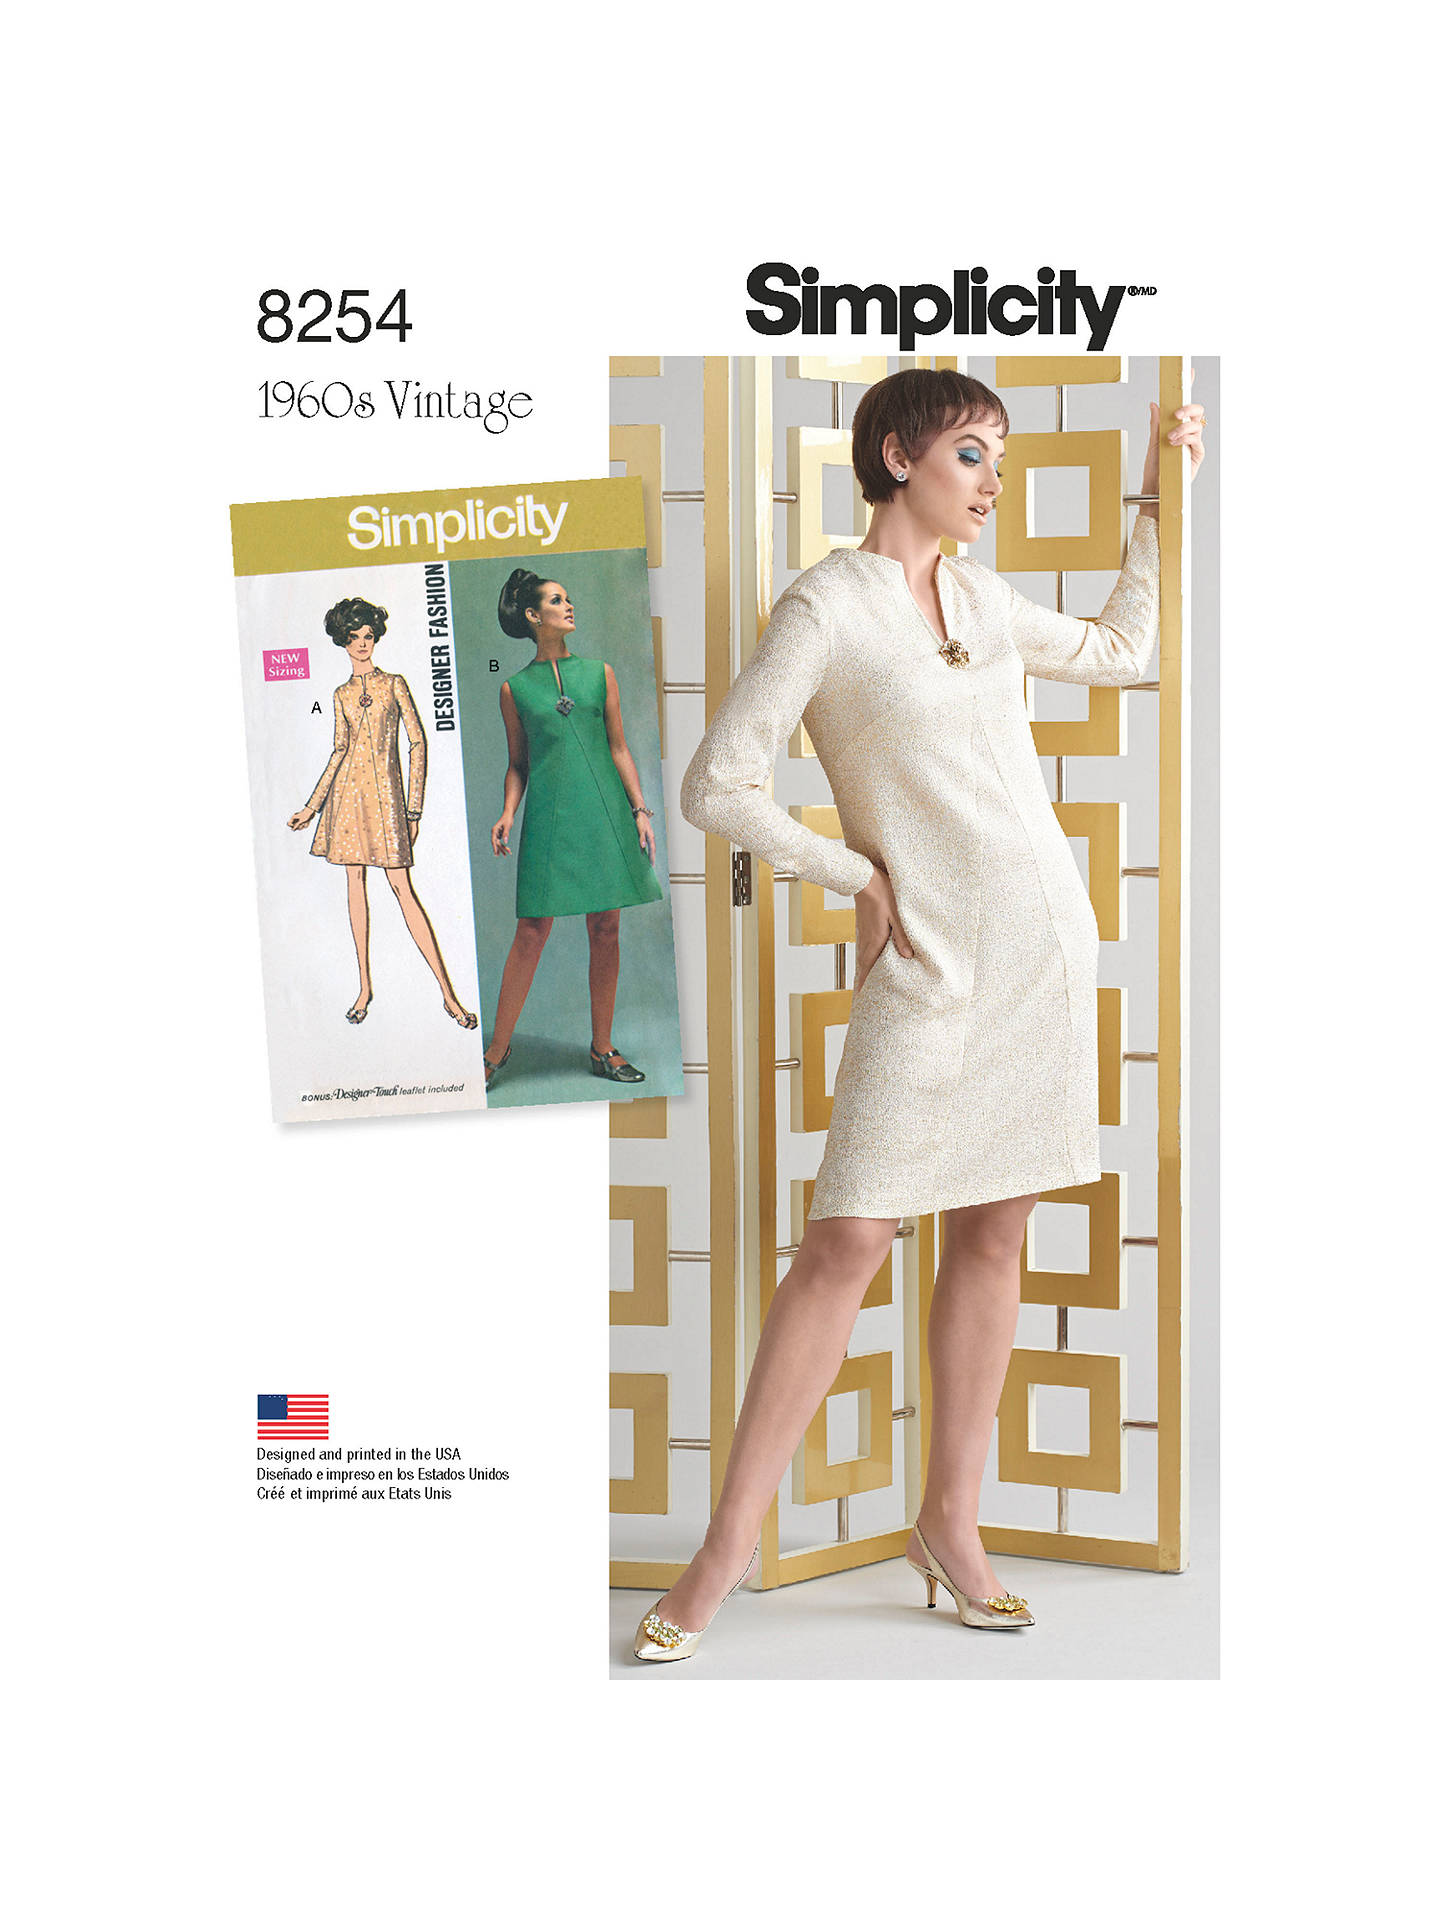 6c2e9595cc5c4 Buy Simplicity Vintage Women's and Plus Size 1960s Dresses Sewing Pattern,  8254, BB Online ...